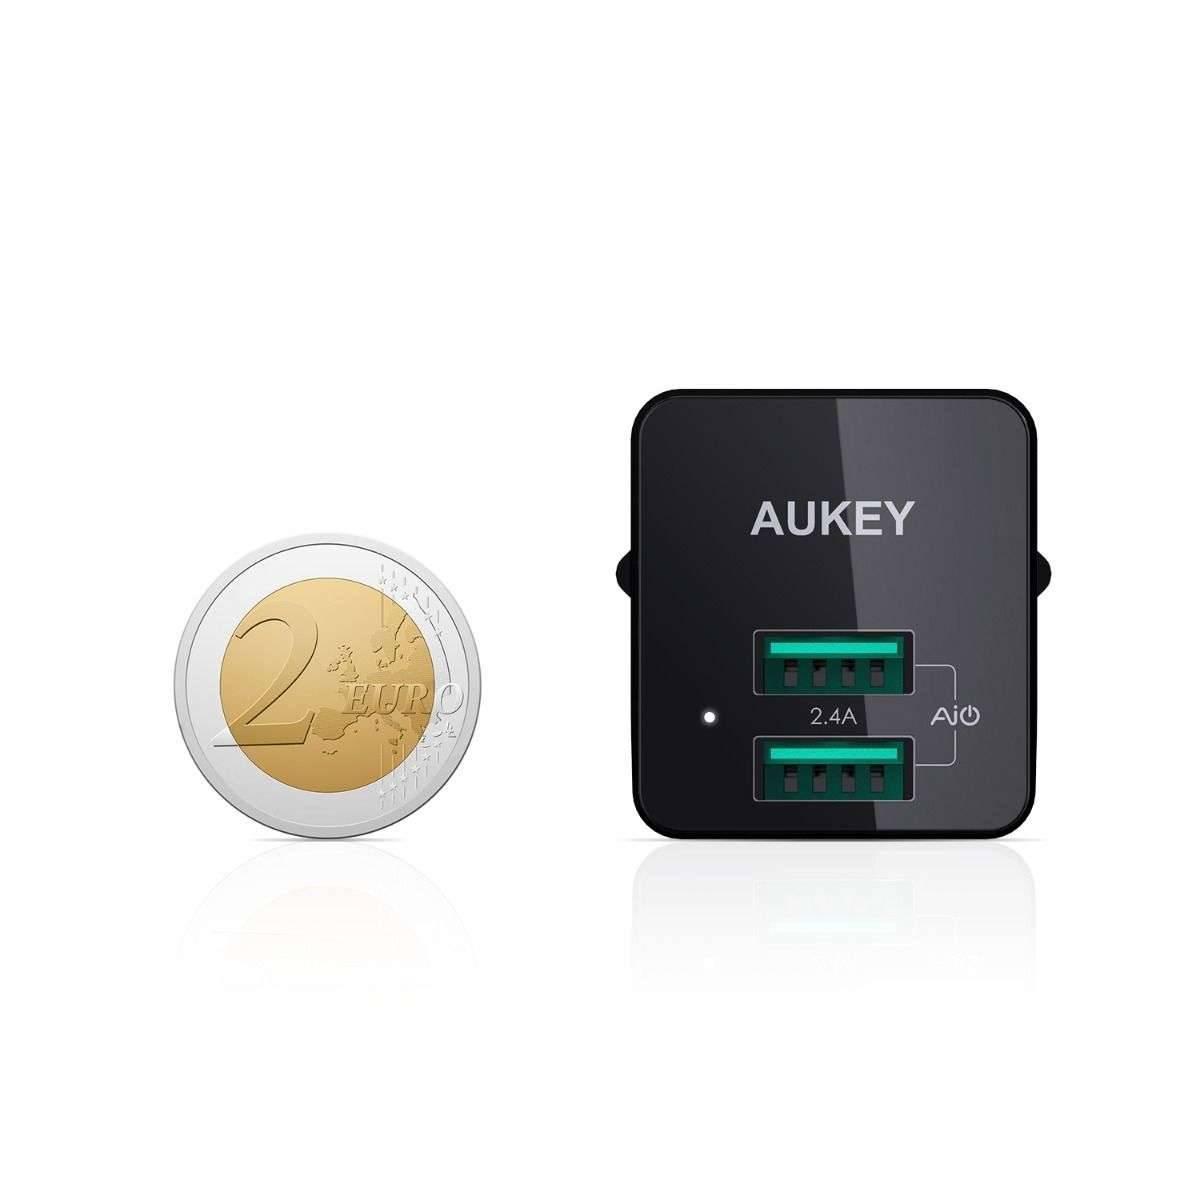 Aukey Dual USB laddare 2x USB laddare (upp till 12W)